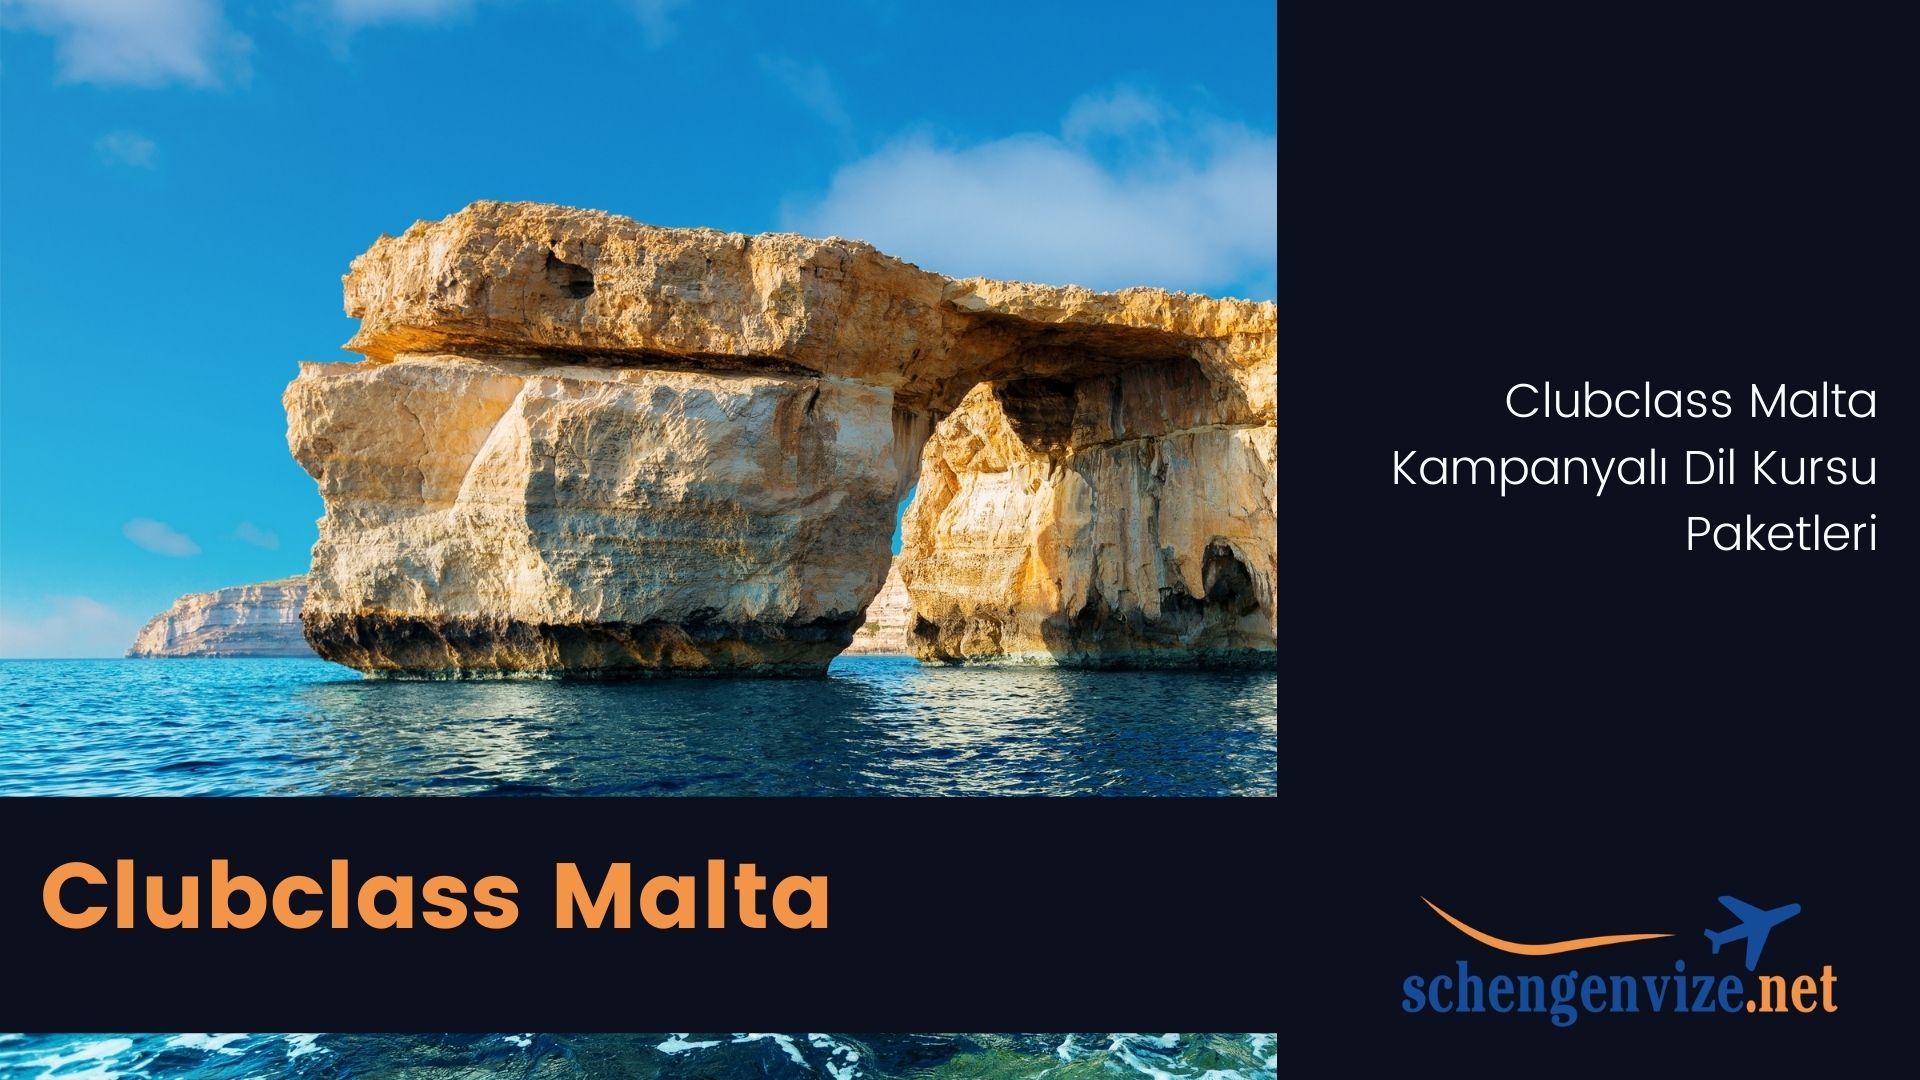 Clubclass Malta Programı